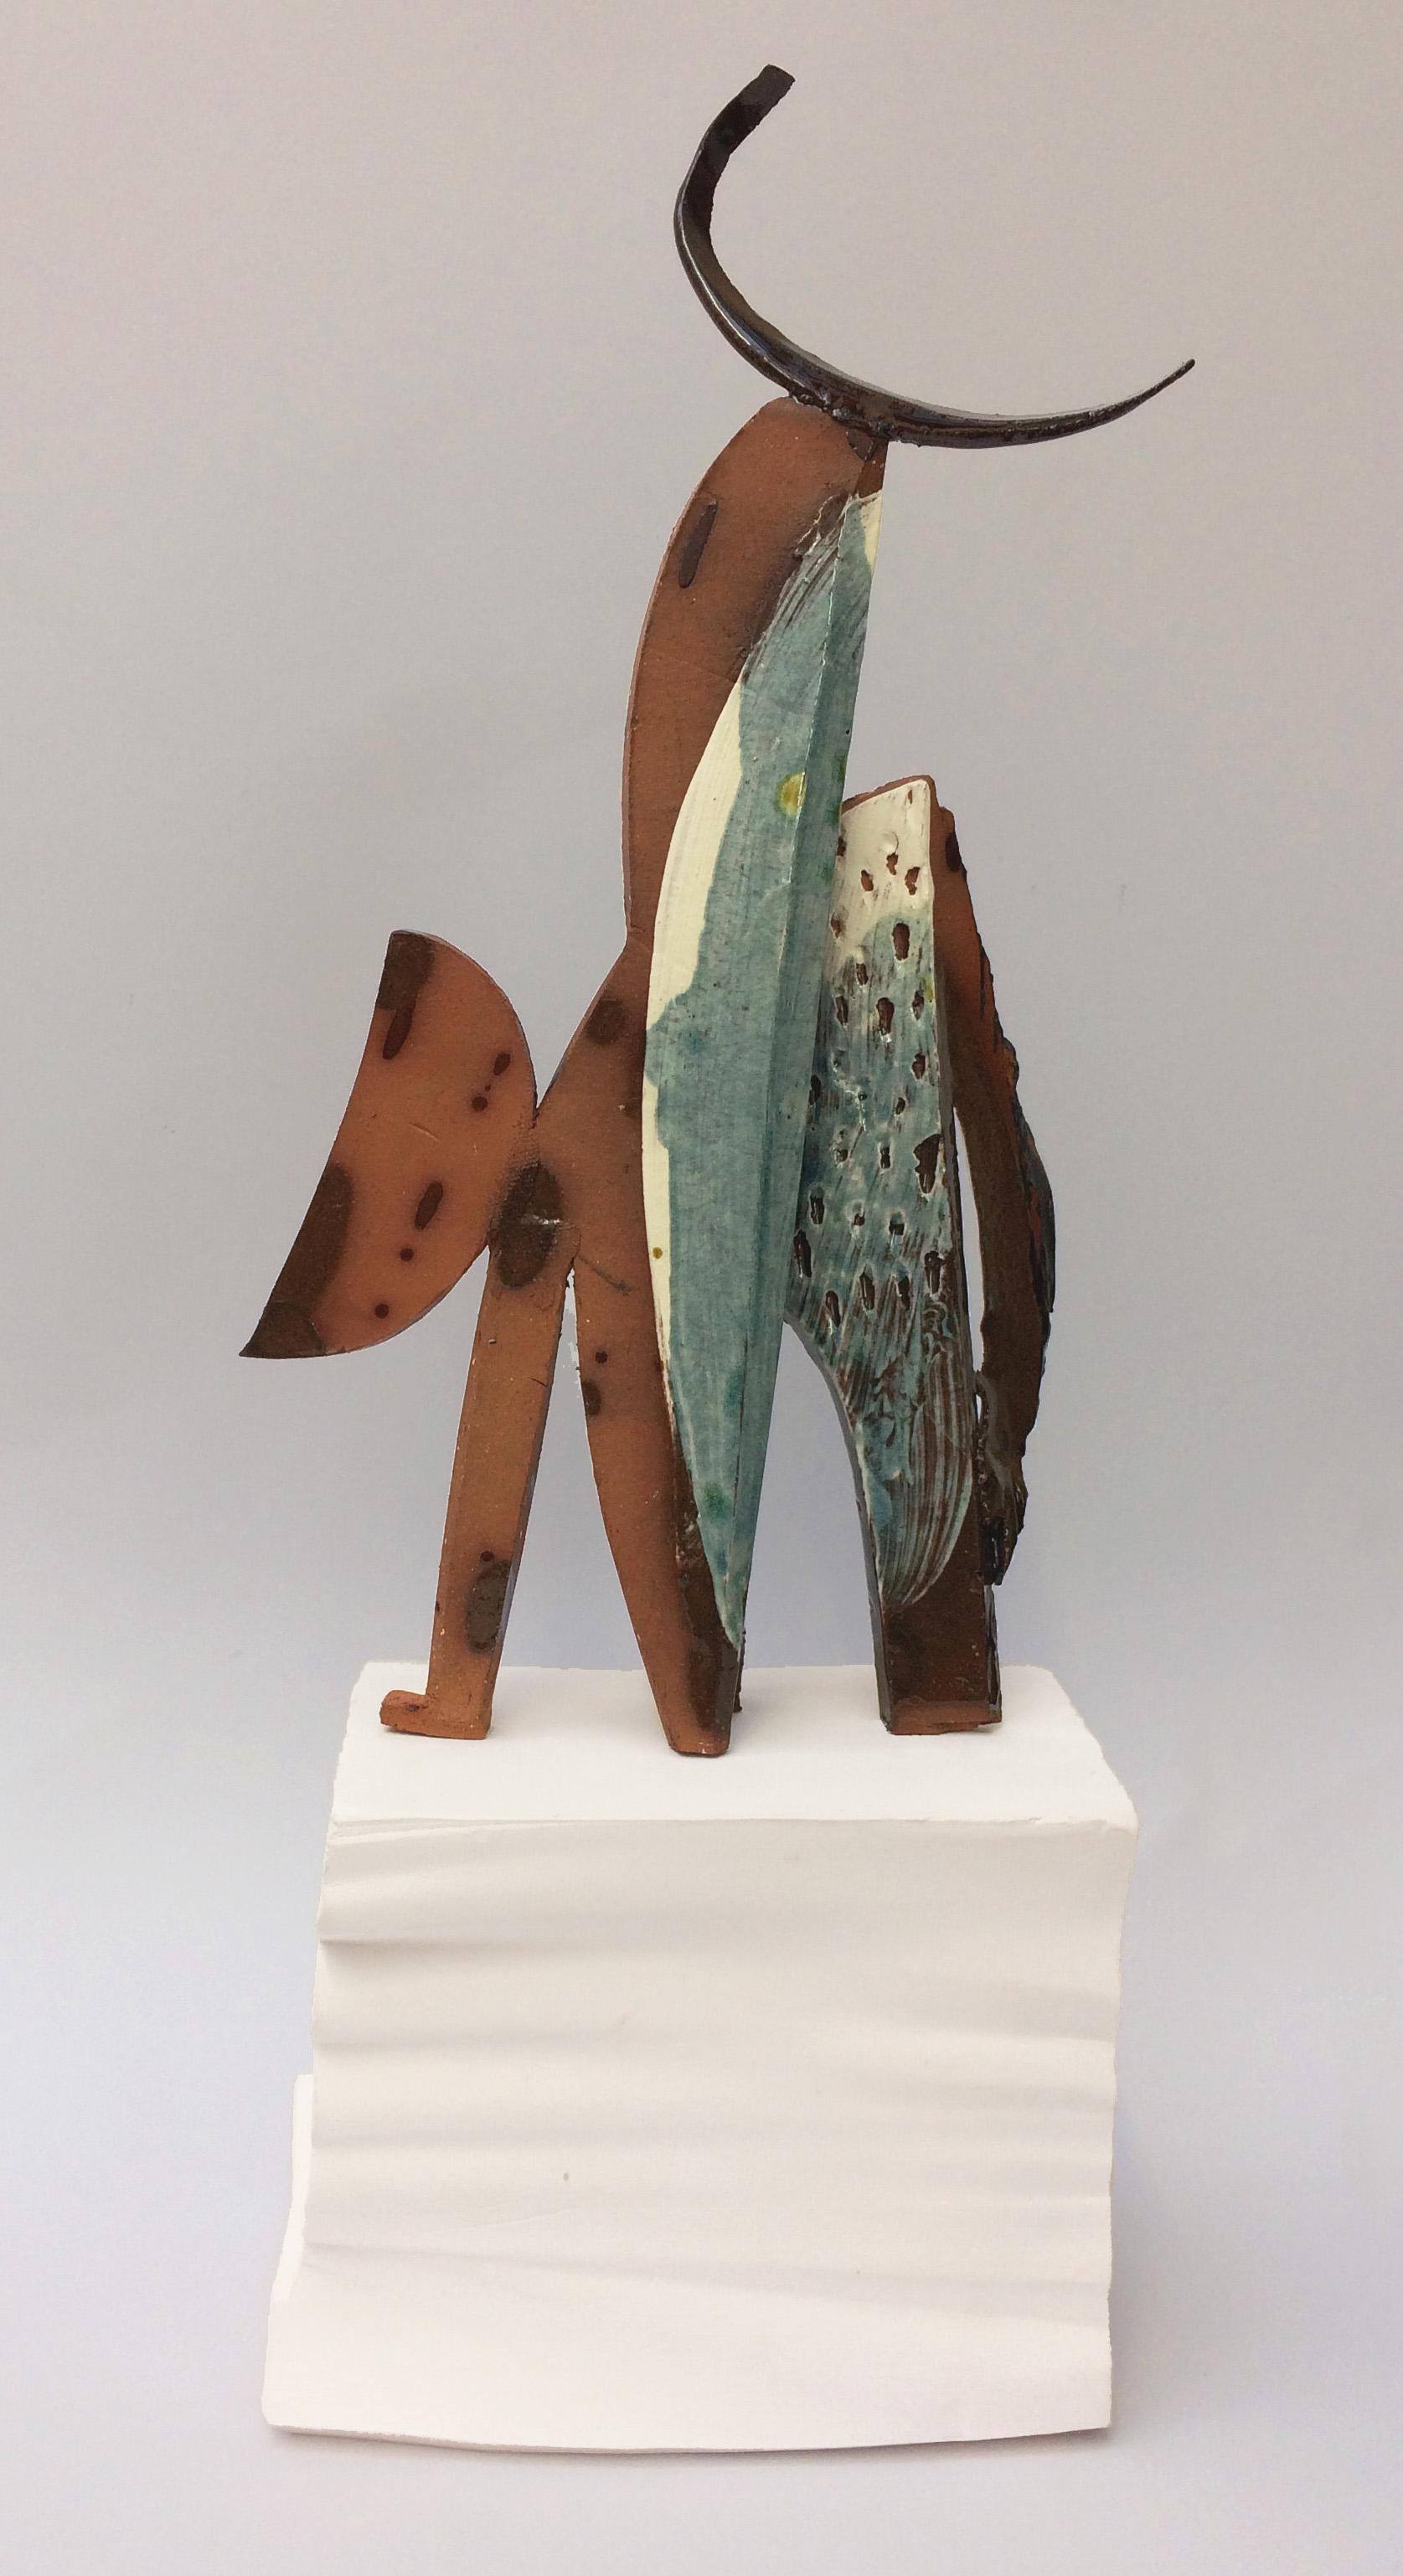 Tall Minotaure - H 25cm x W 15cm